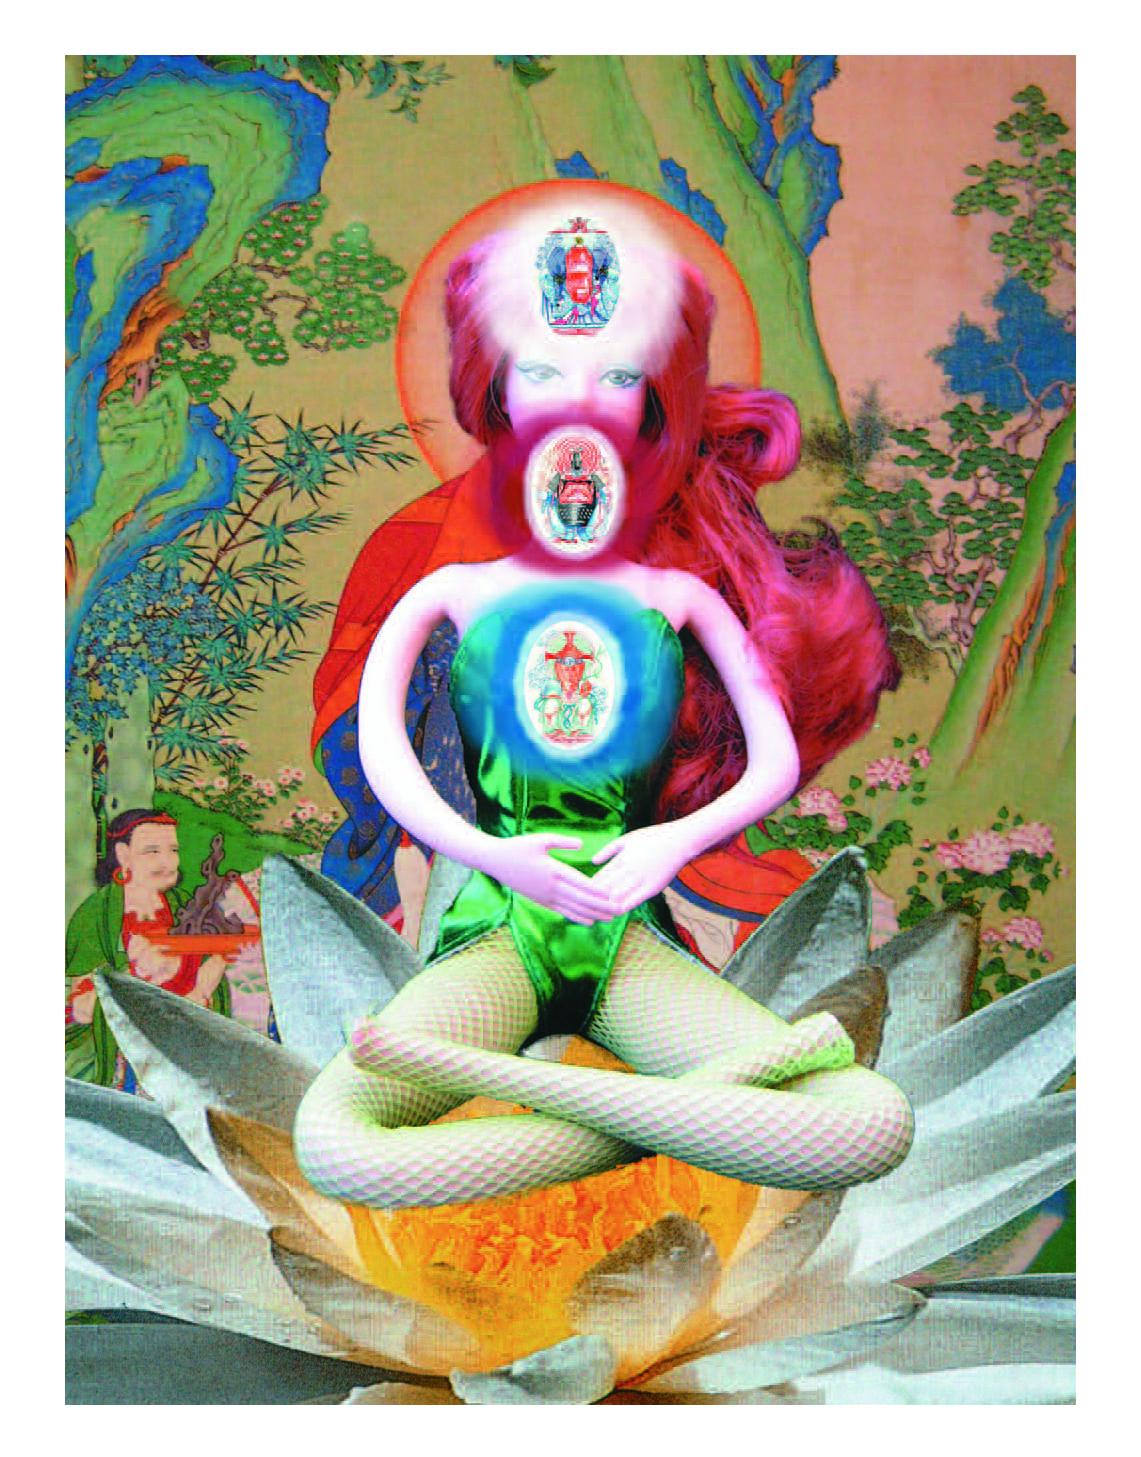 Carolyn Gimian Chögyam Trungpa Rinpoche Ego Happiness Kalachakra Tantra Materialism Shambhala Sun - Sept '05